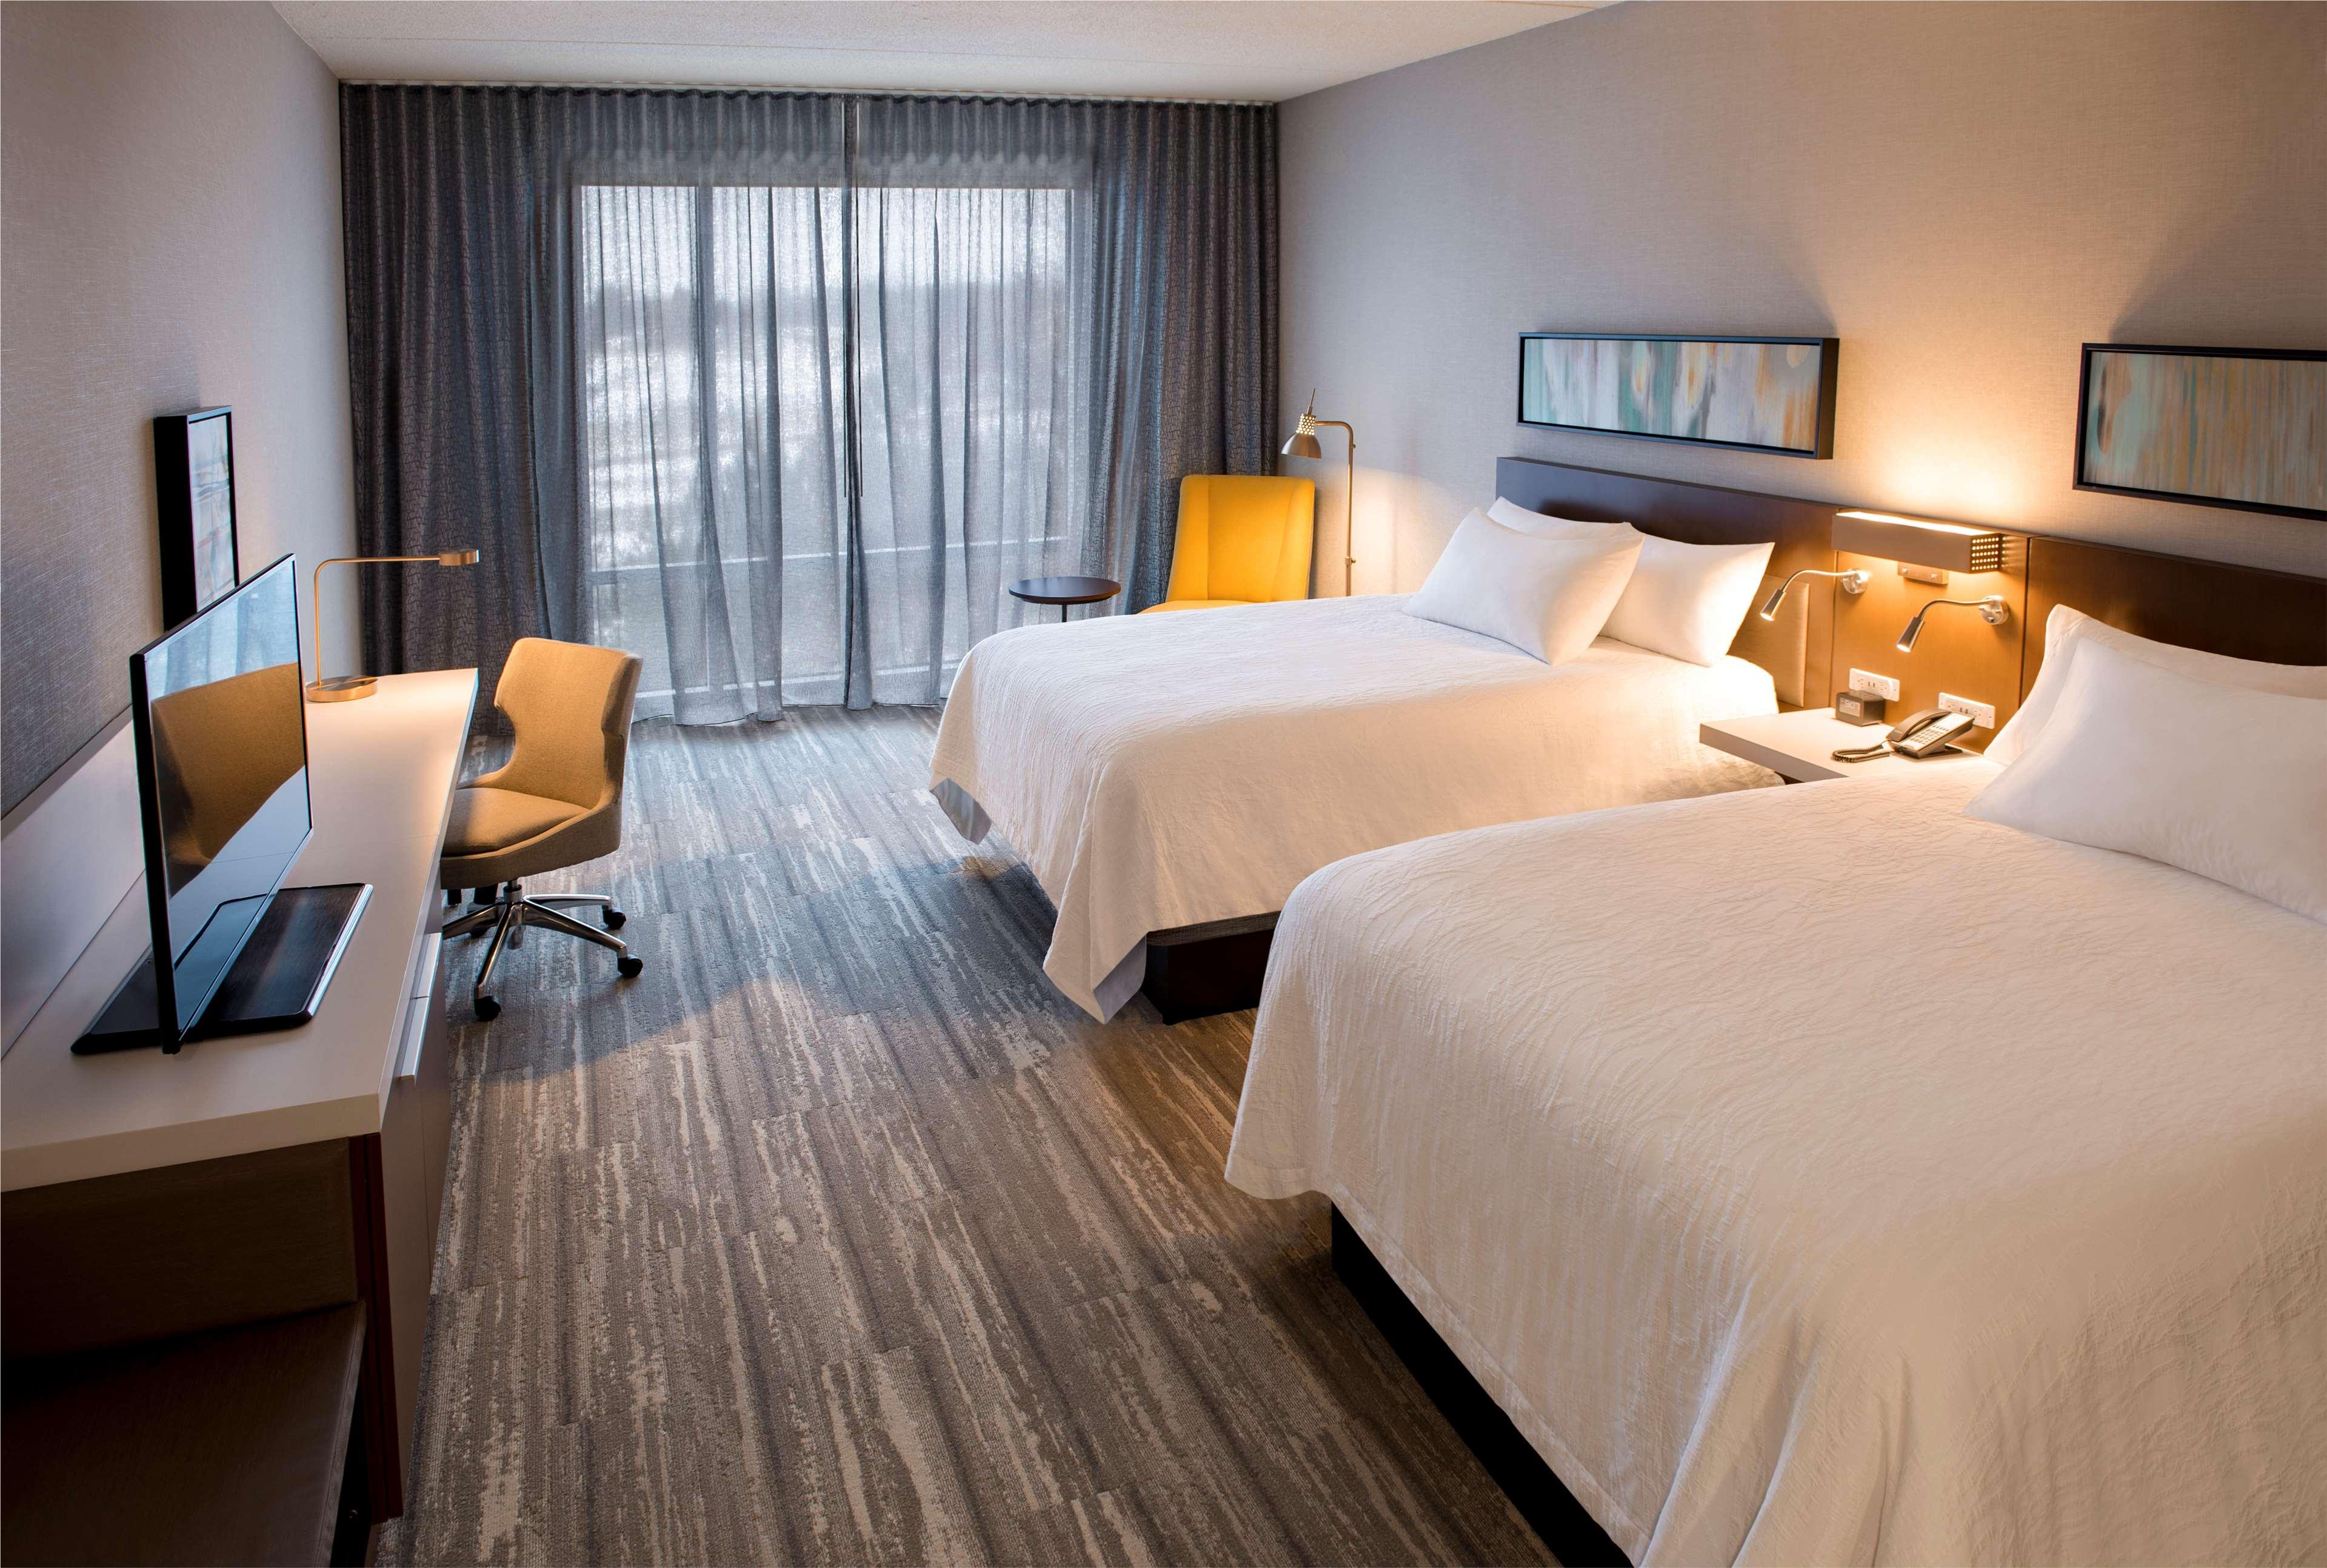 Hilton Garden Inn Wausau image 15